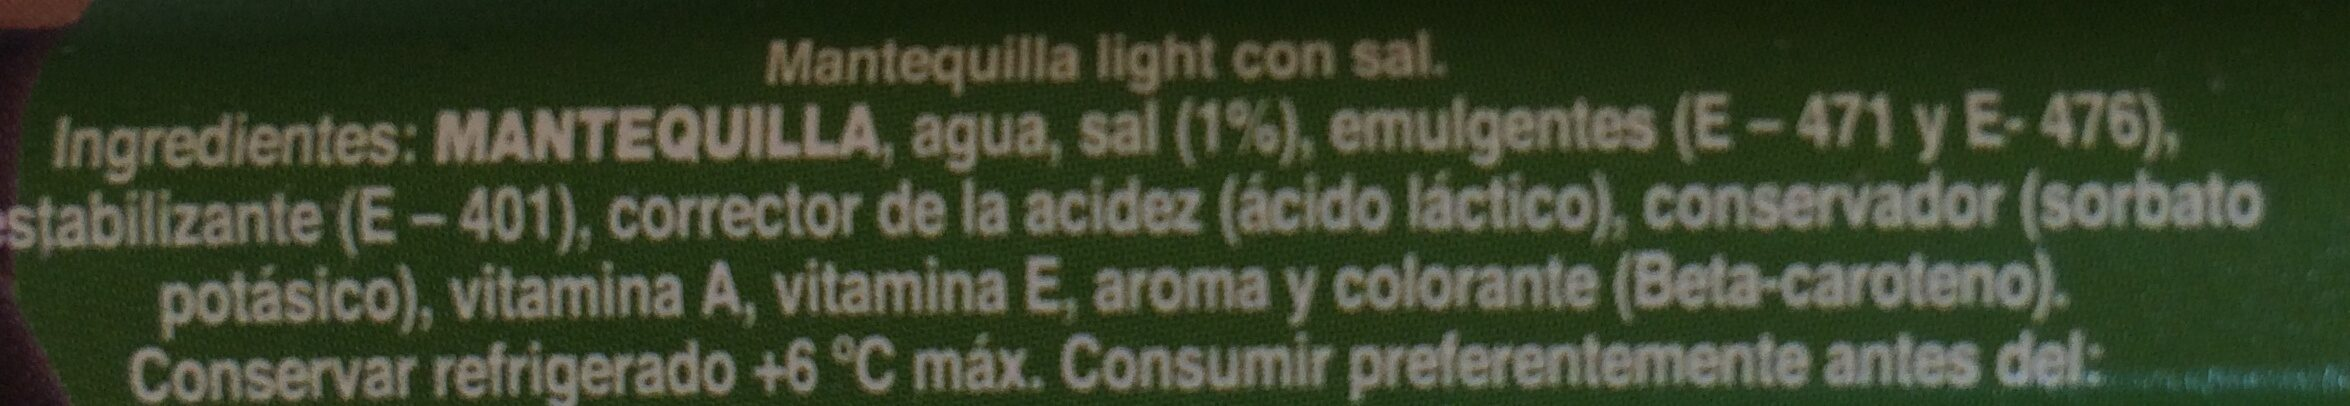 Mantequilla Light con sal - Ingrediënten - es